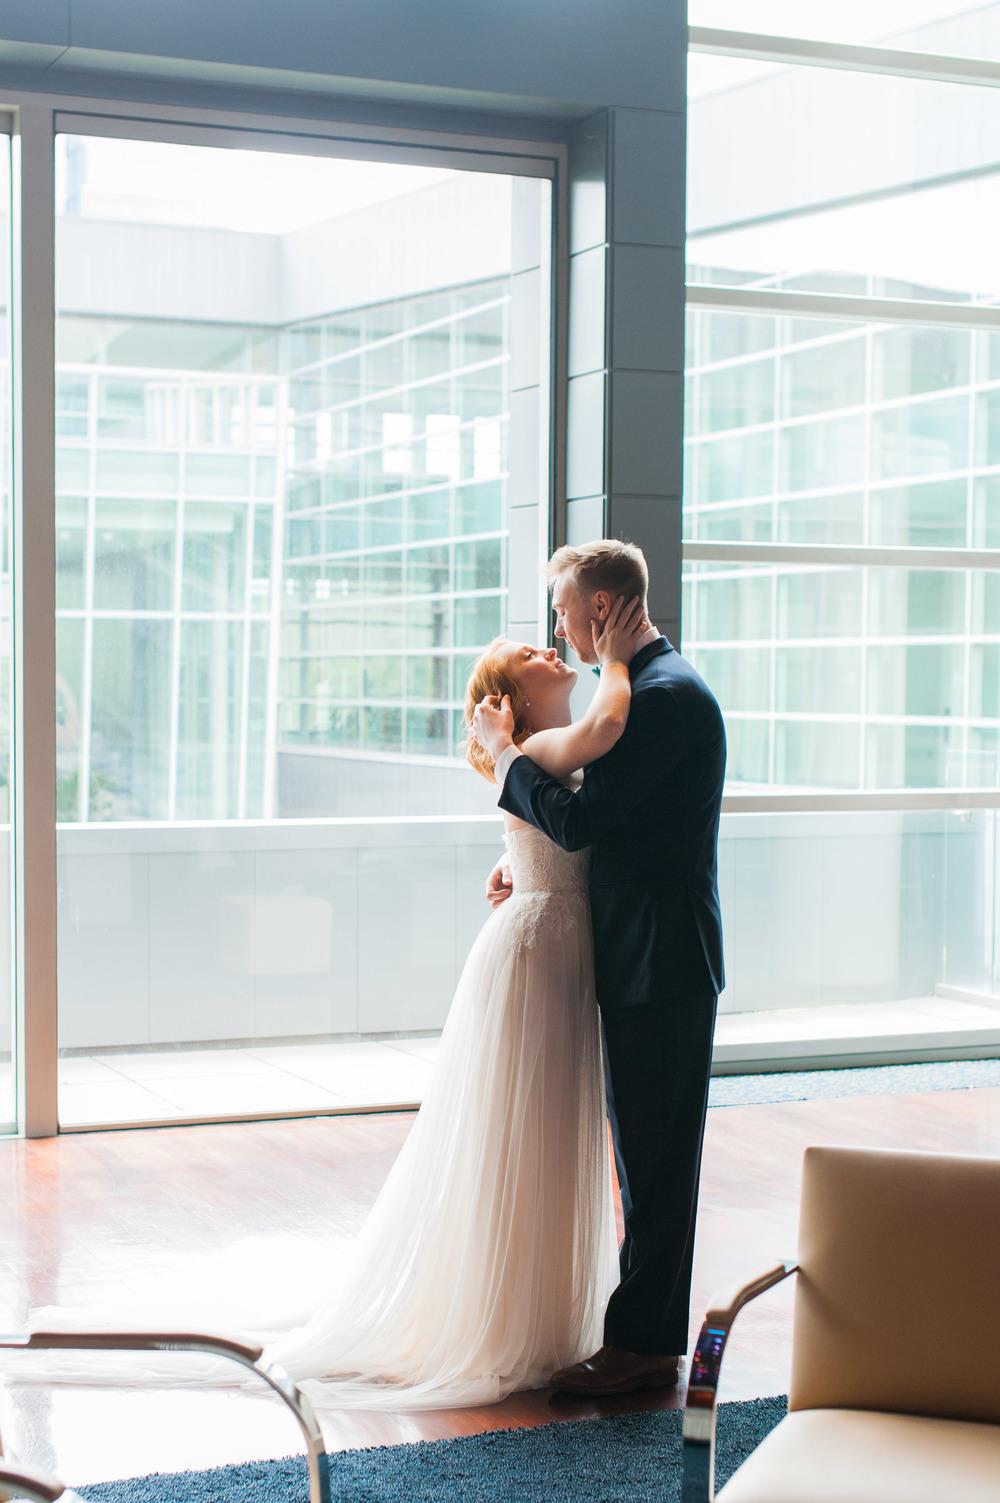 omaha-holland-arts-center-wedding-32.jpg